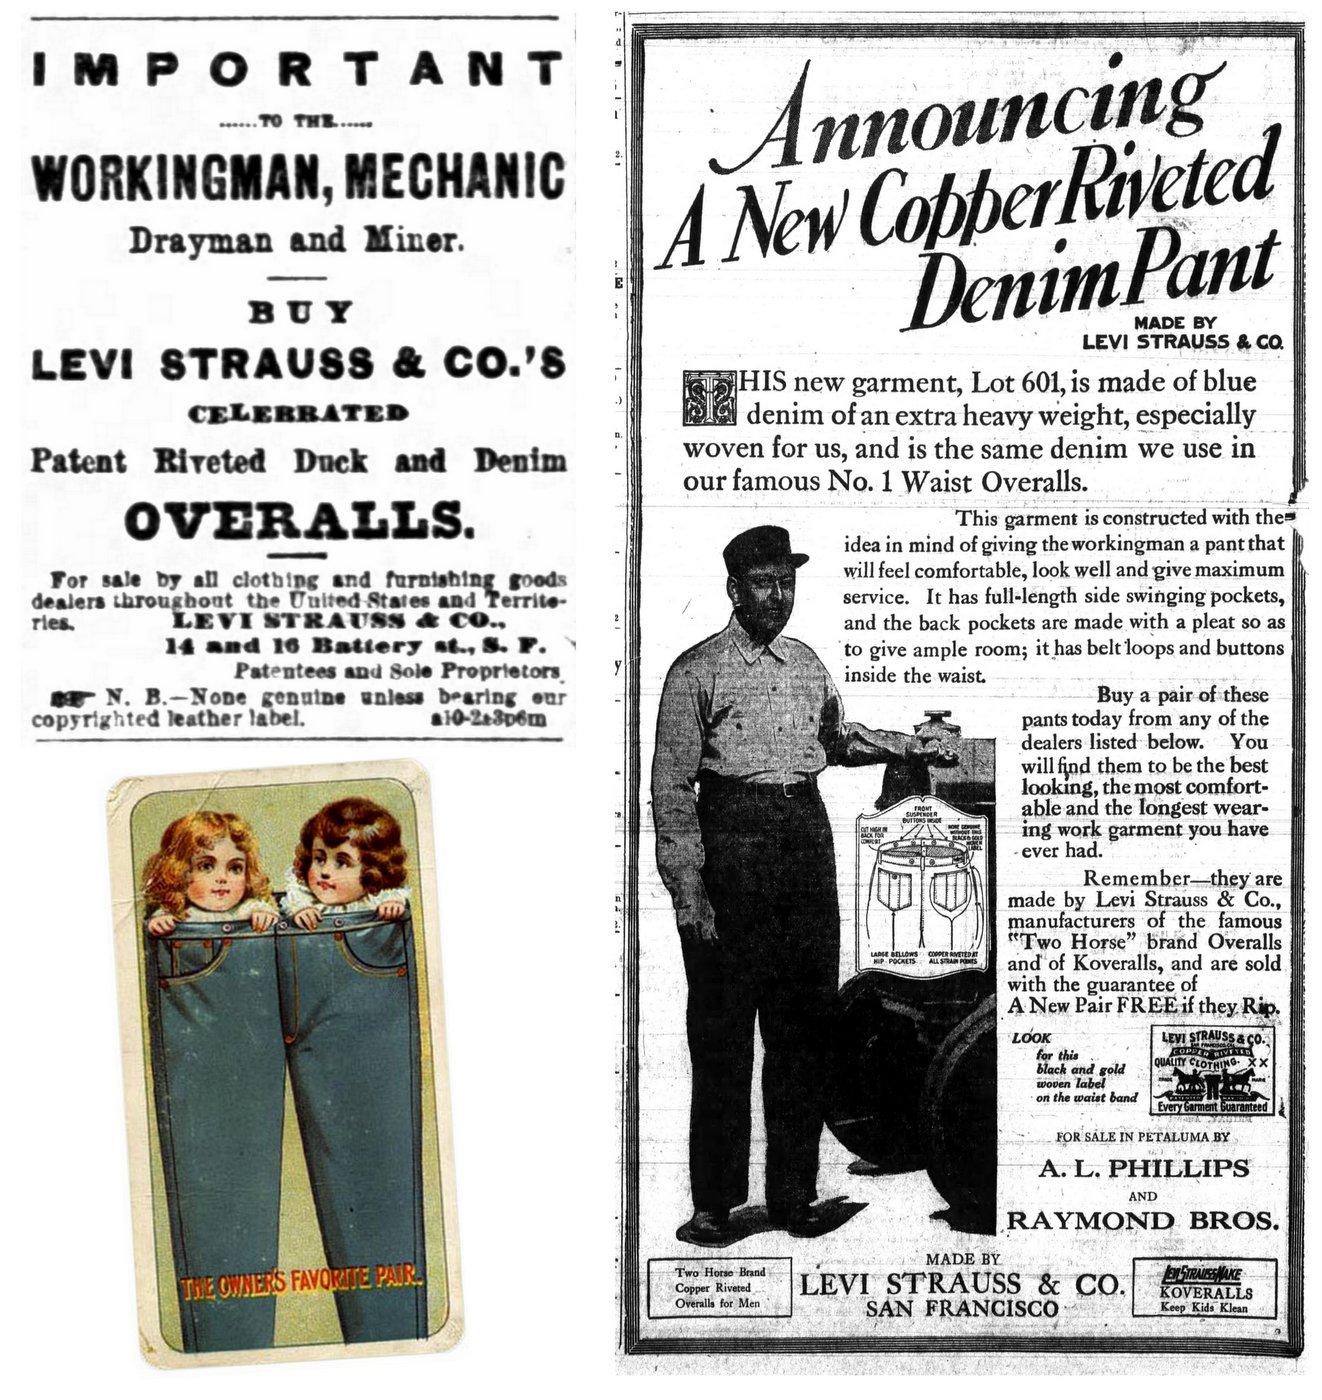 Vintage Levi Strauss ads